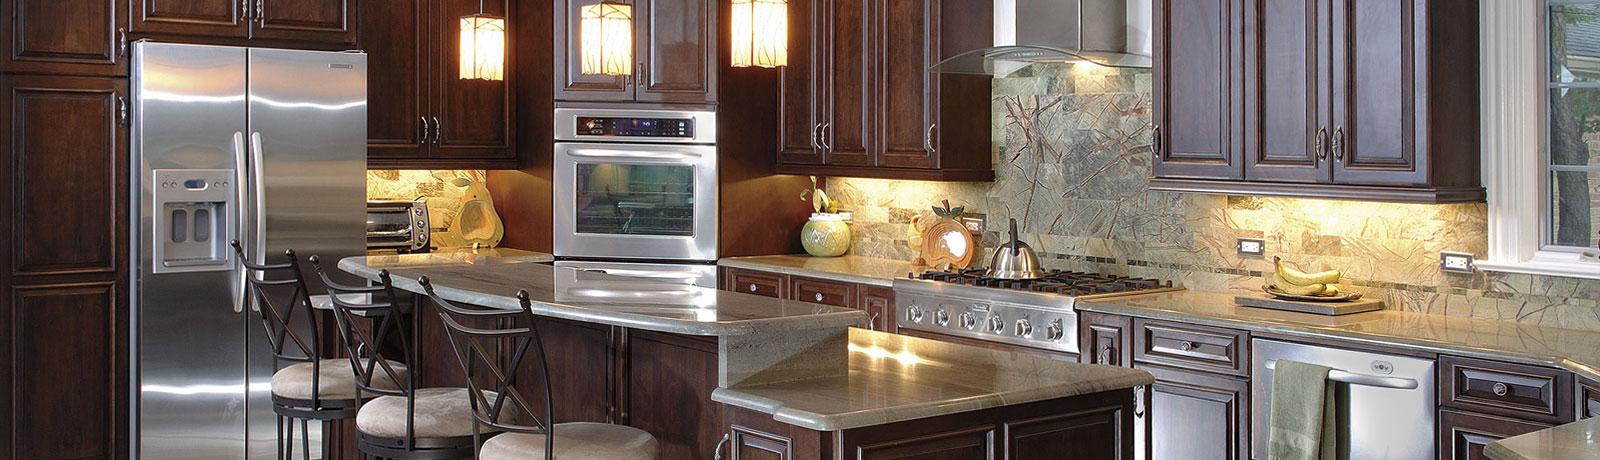 Kitchen Cabinets, Bath Cabinets | Advanced Cabinets Corp